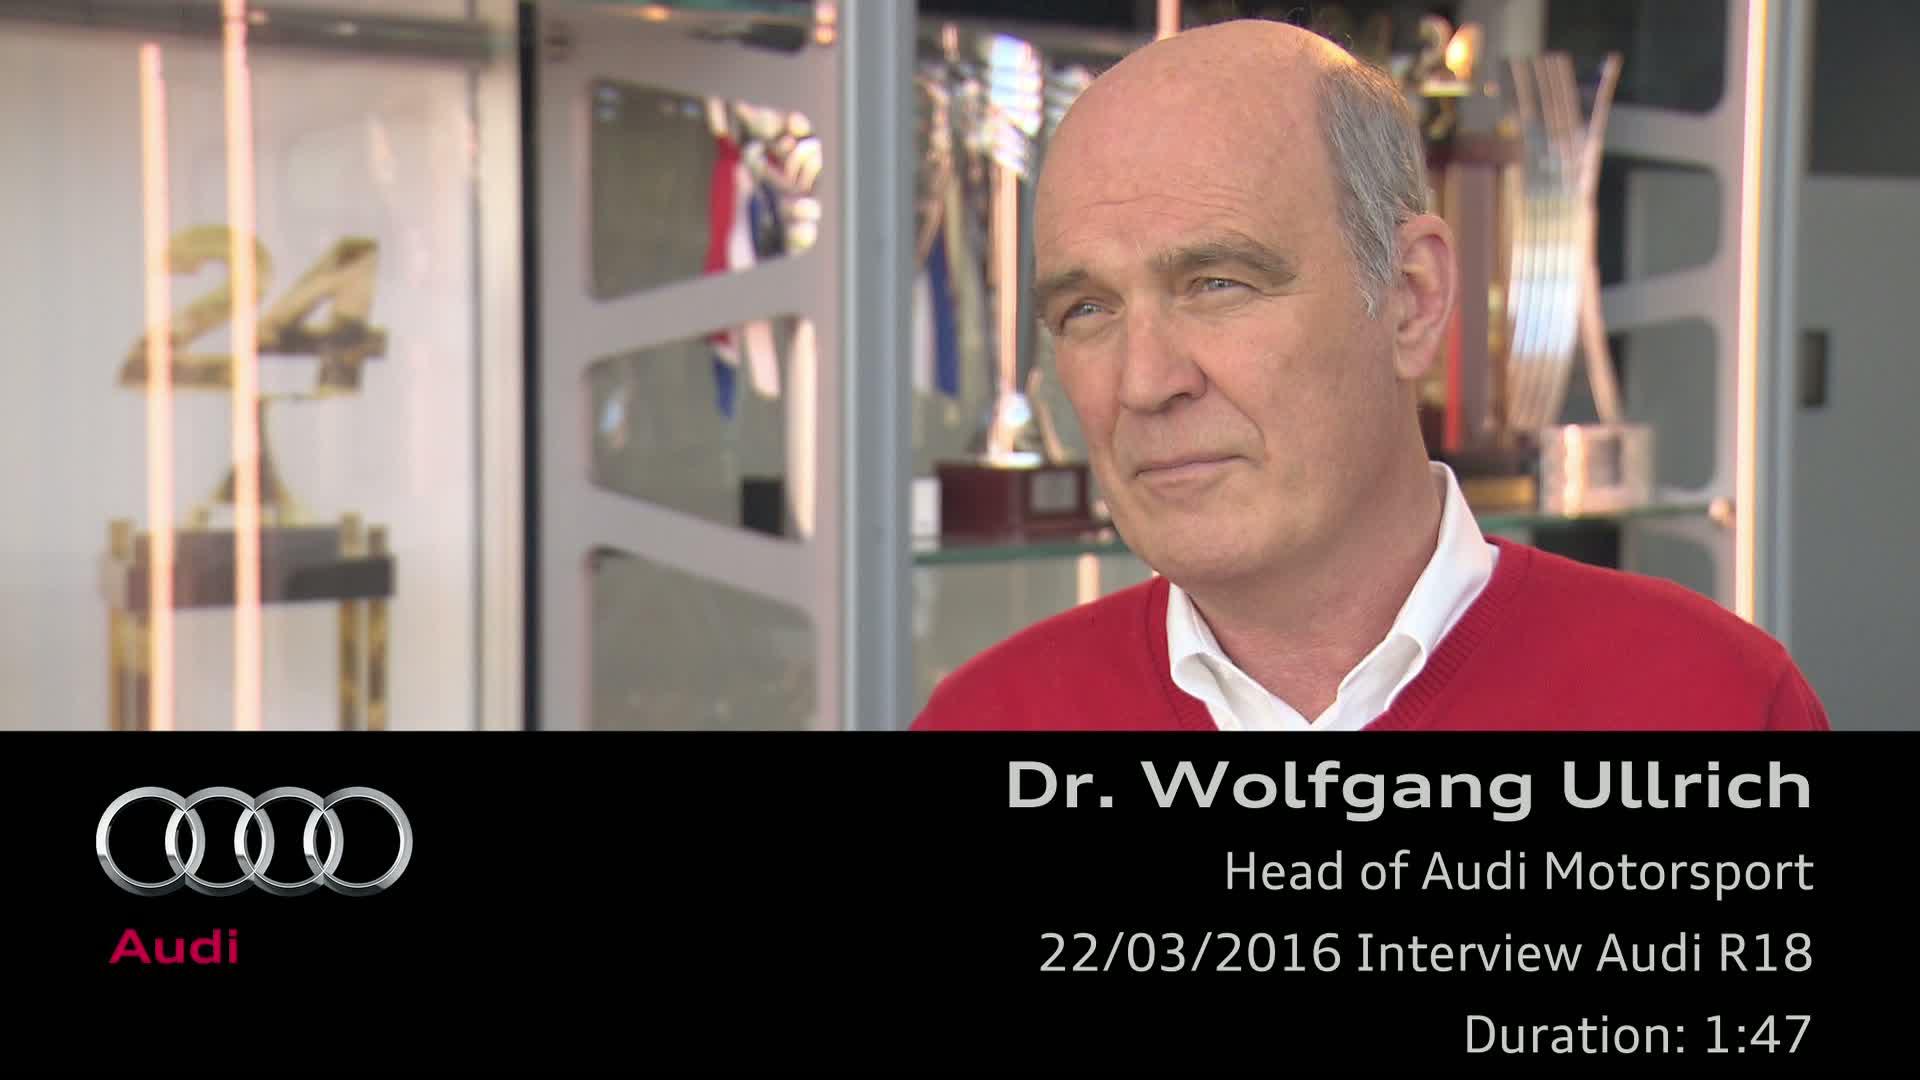 Head of Audi Motorsport Dr. Wolfgang Ullrich